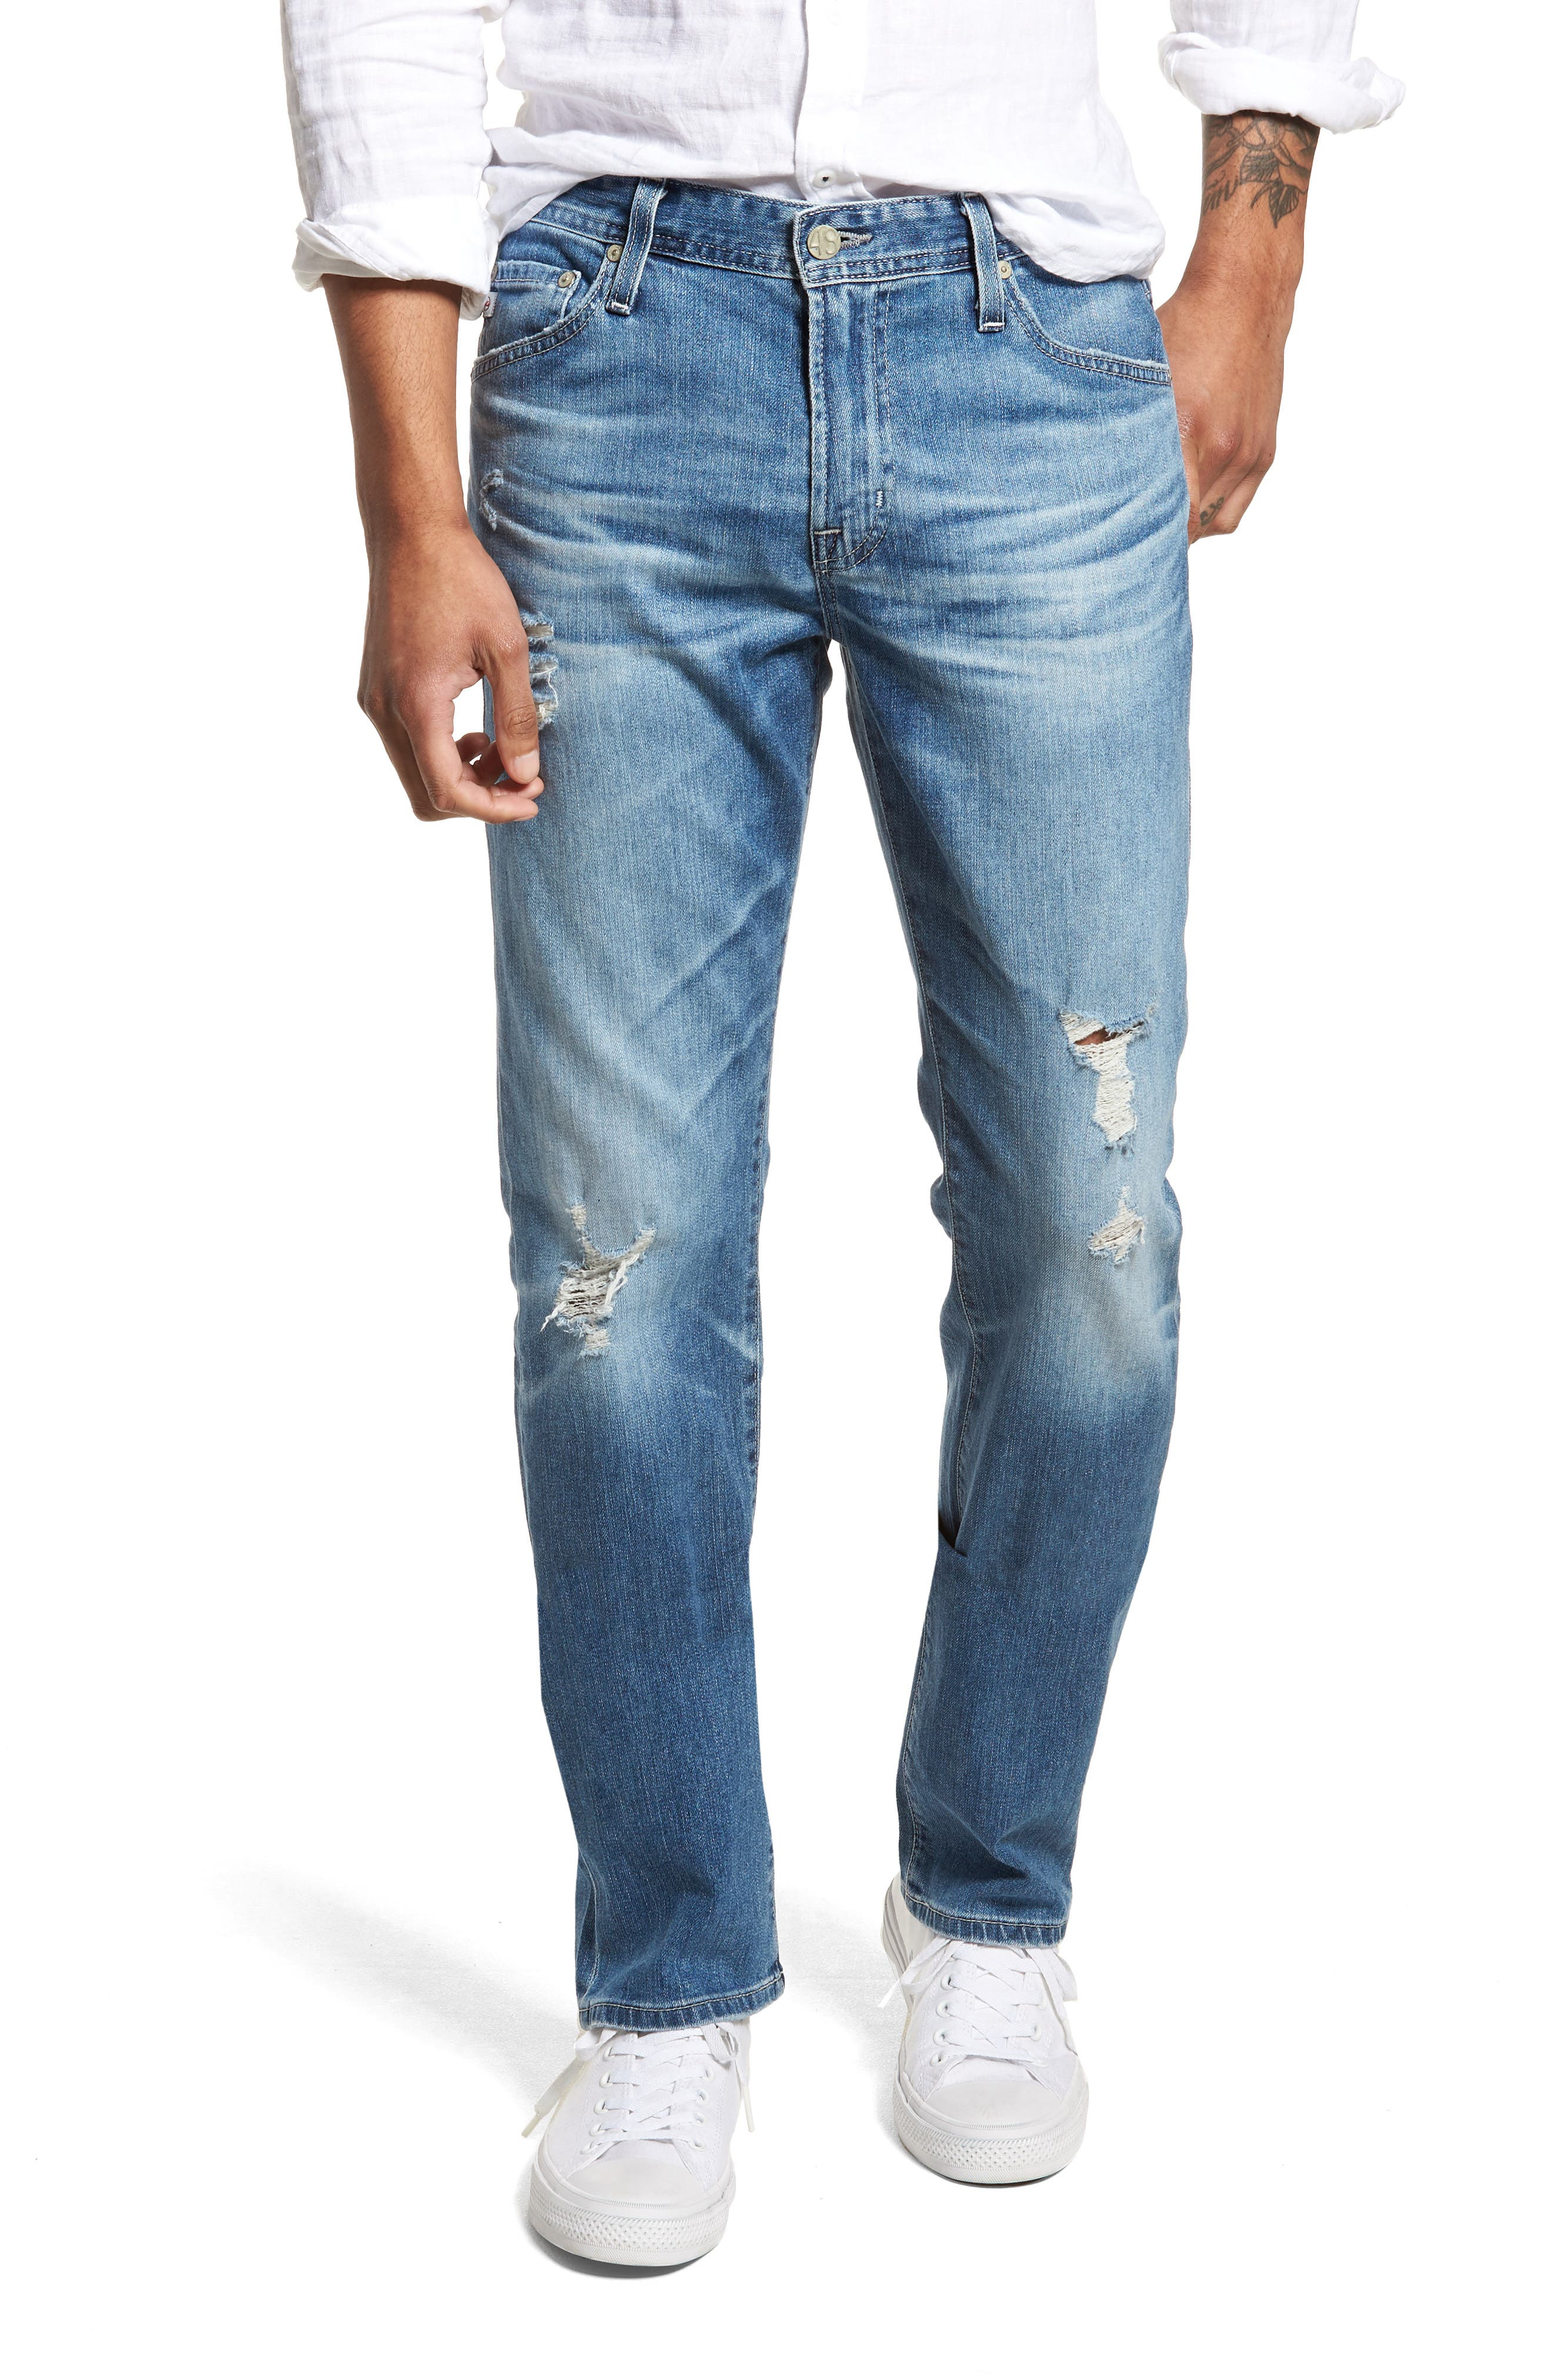 Everett Slim Straight Leg Jeans,                             Main thumbnail 1, color,                             15 YEARS SWEPT UP